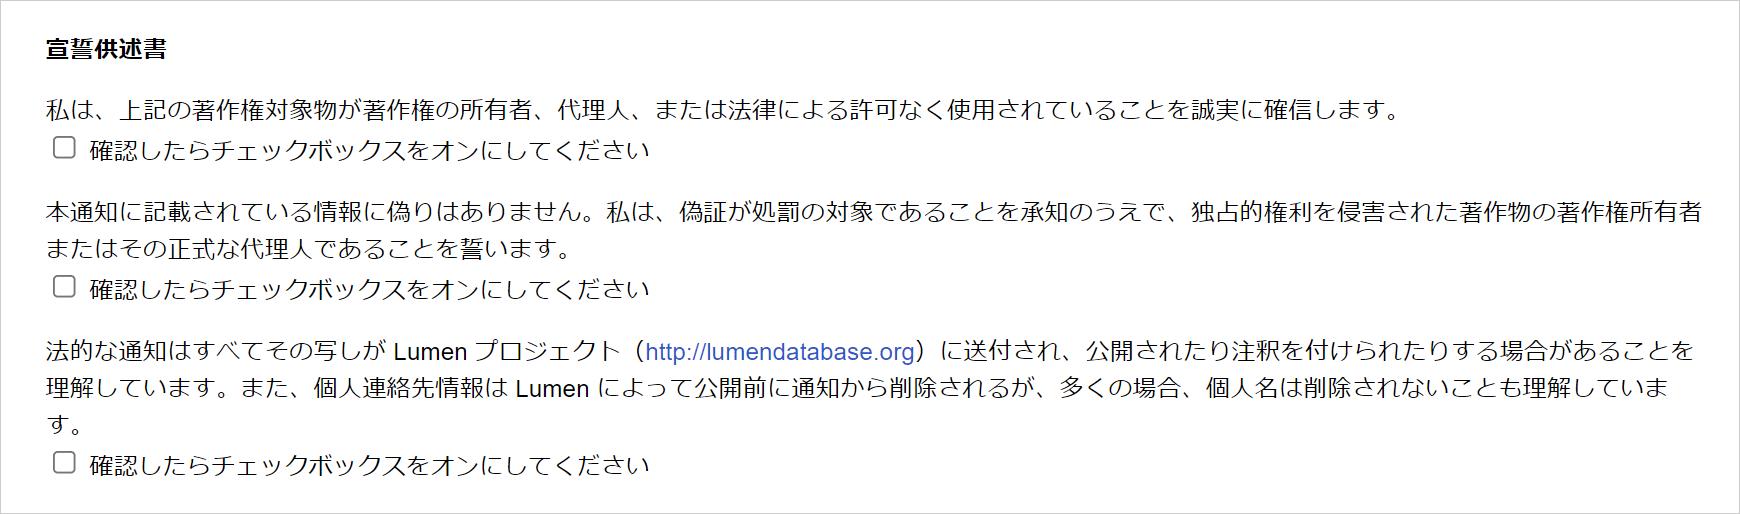 DMCA申請のために「宣誓供述書」の内容を確認してチェックする